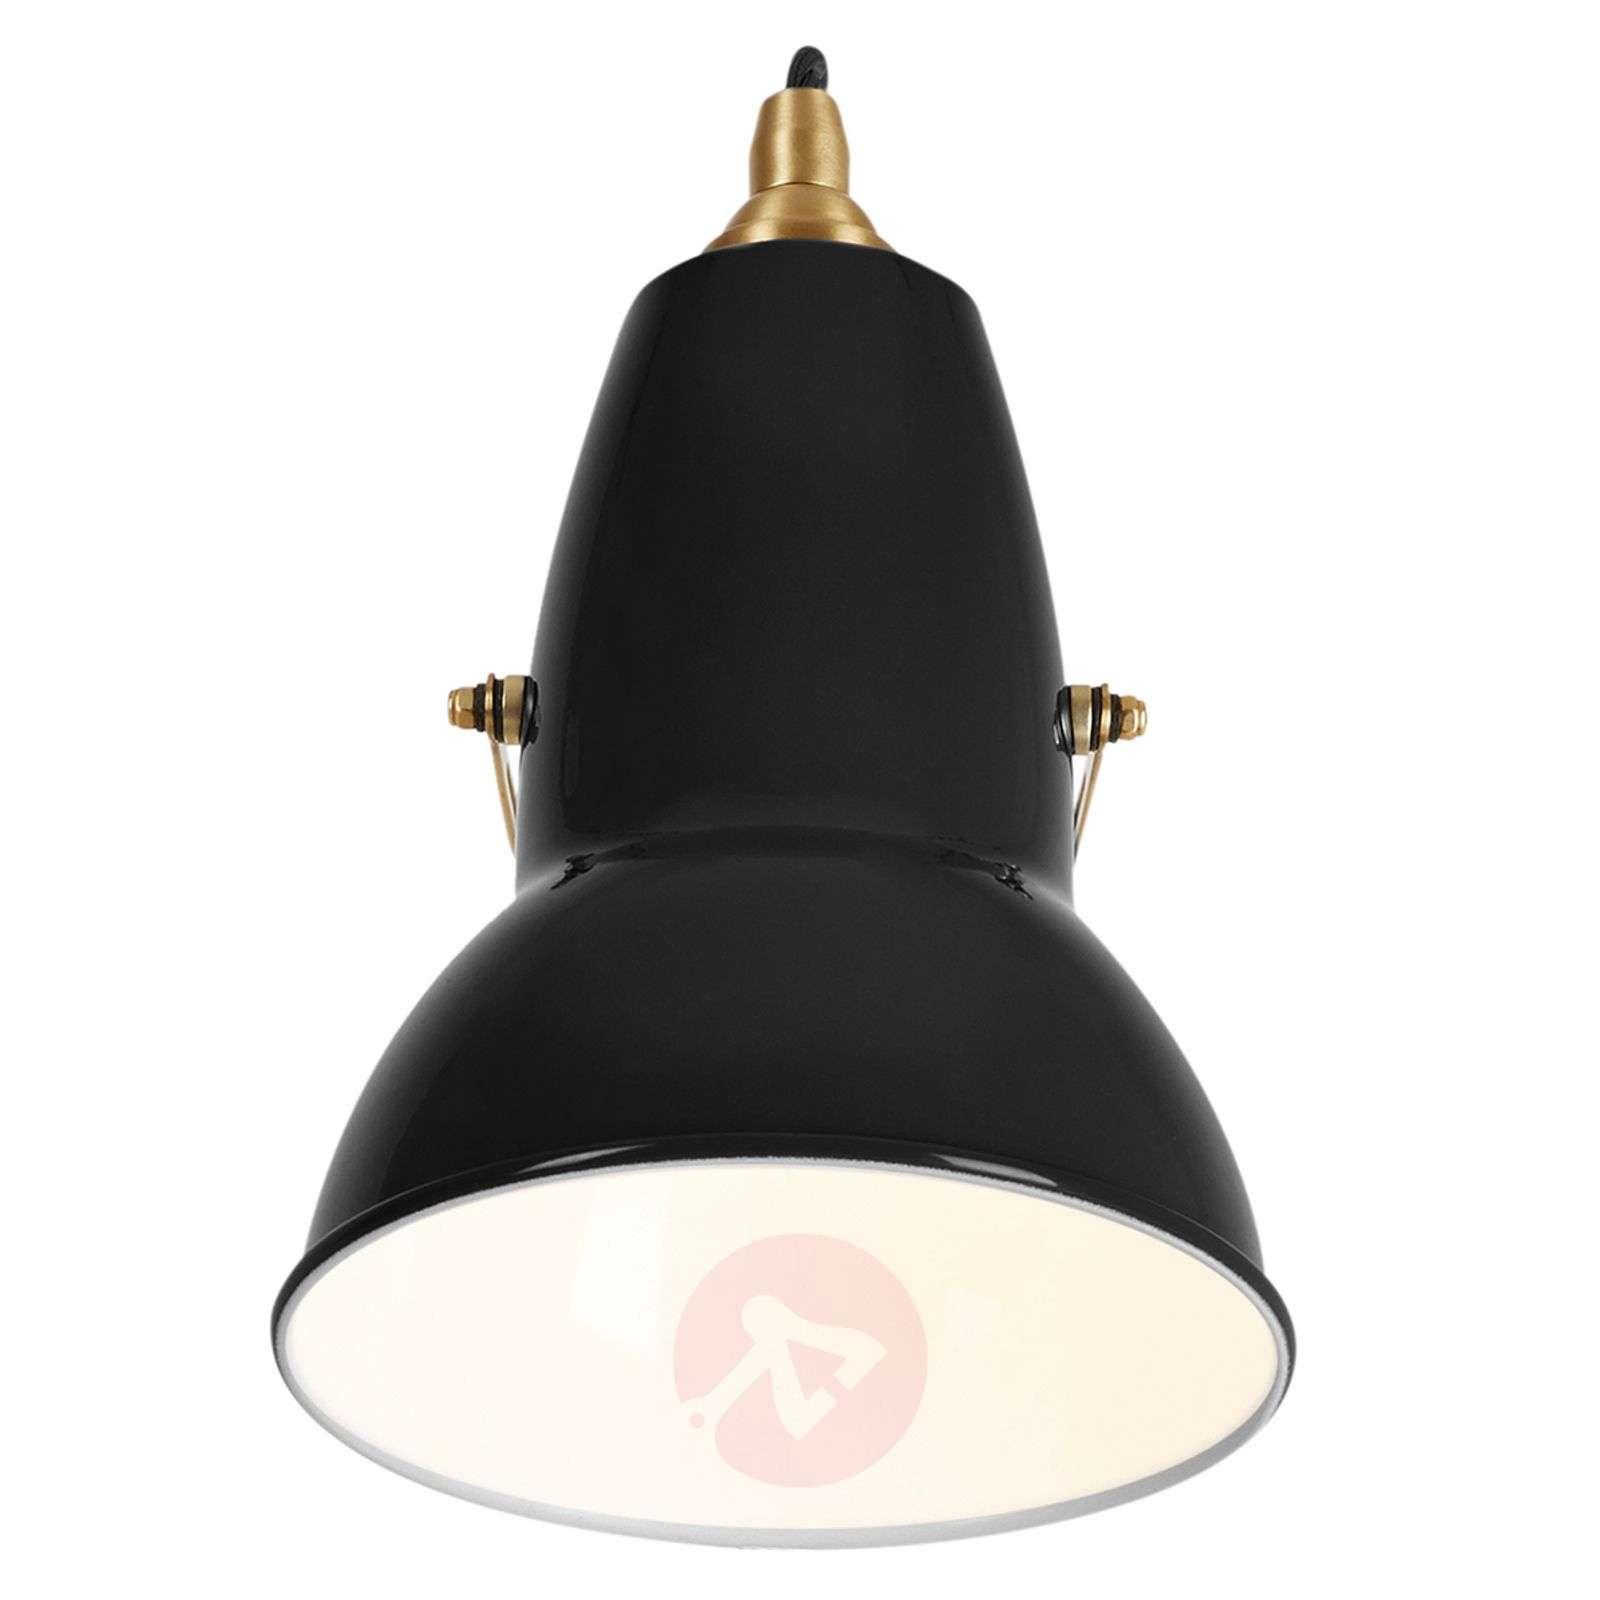 Anglepoise® Original 1227 brass wall lamp-1073096X-01